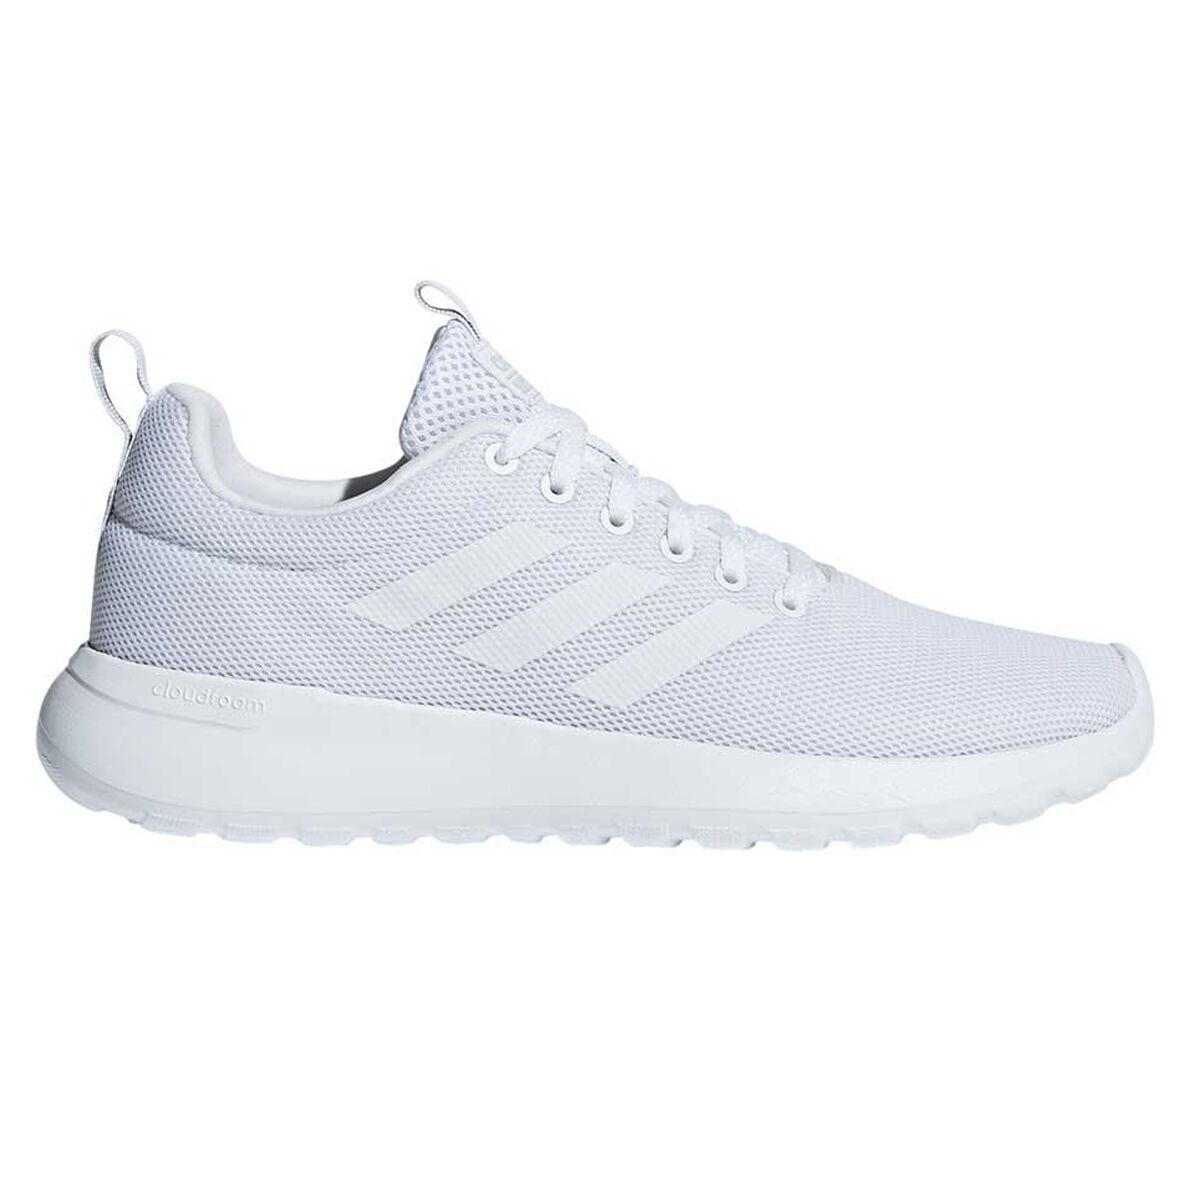 adidas Lite Racer CLN Womens Casual Shoes